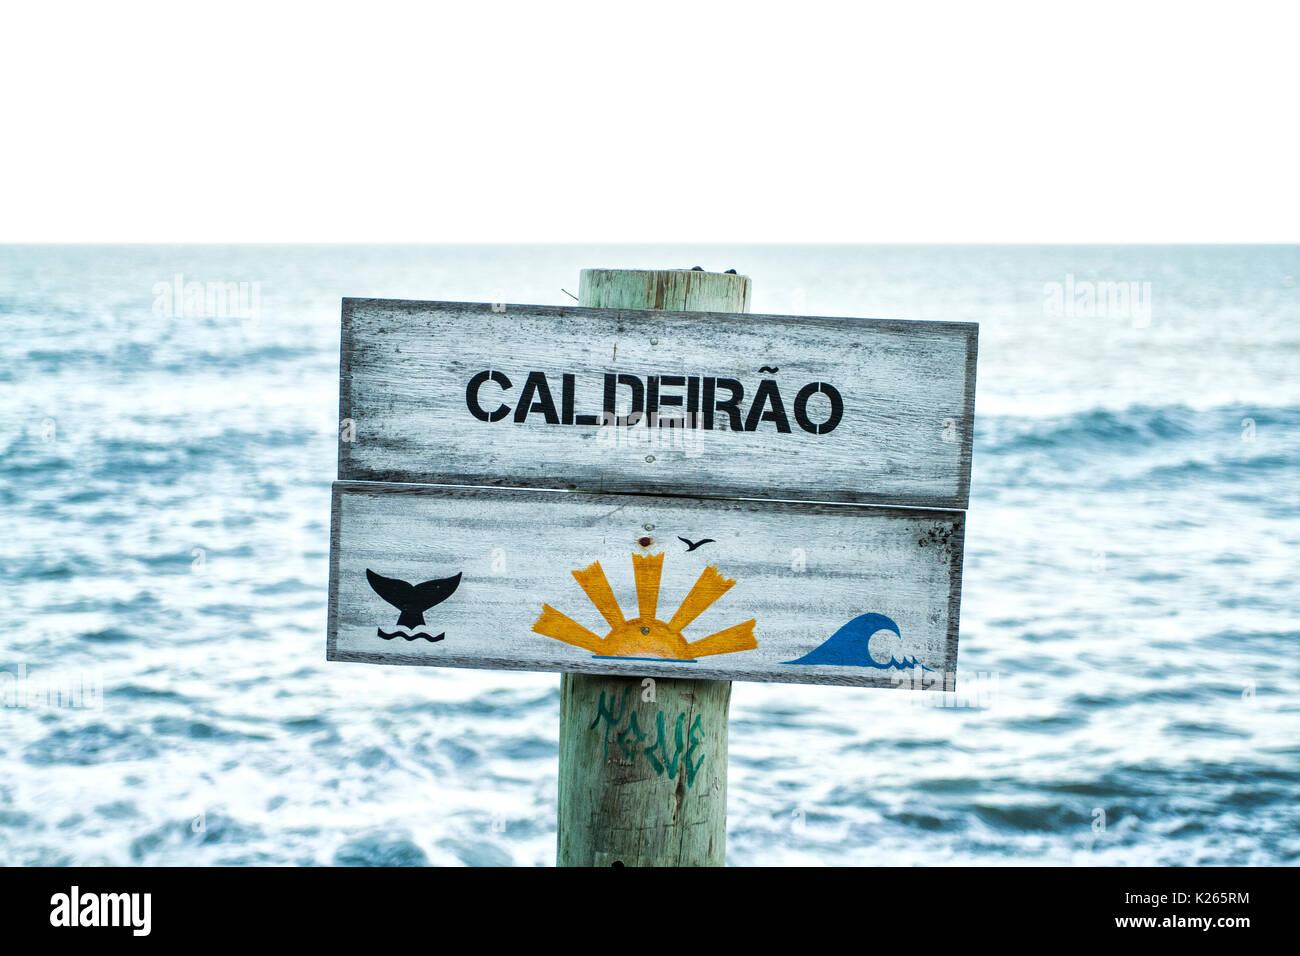 Signage at Armacao Beach. Florianopolis, Santa Catarina, Brazil. - Stock Image